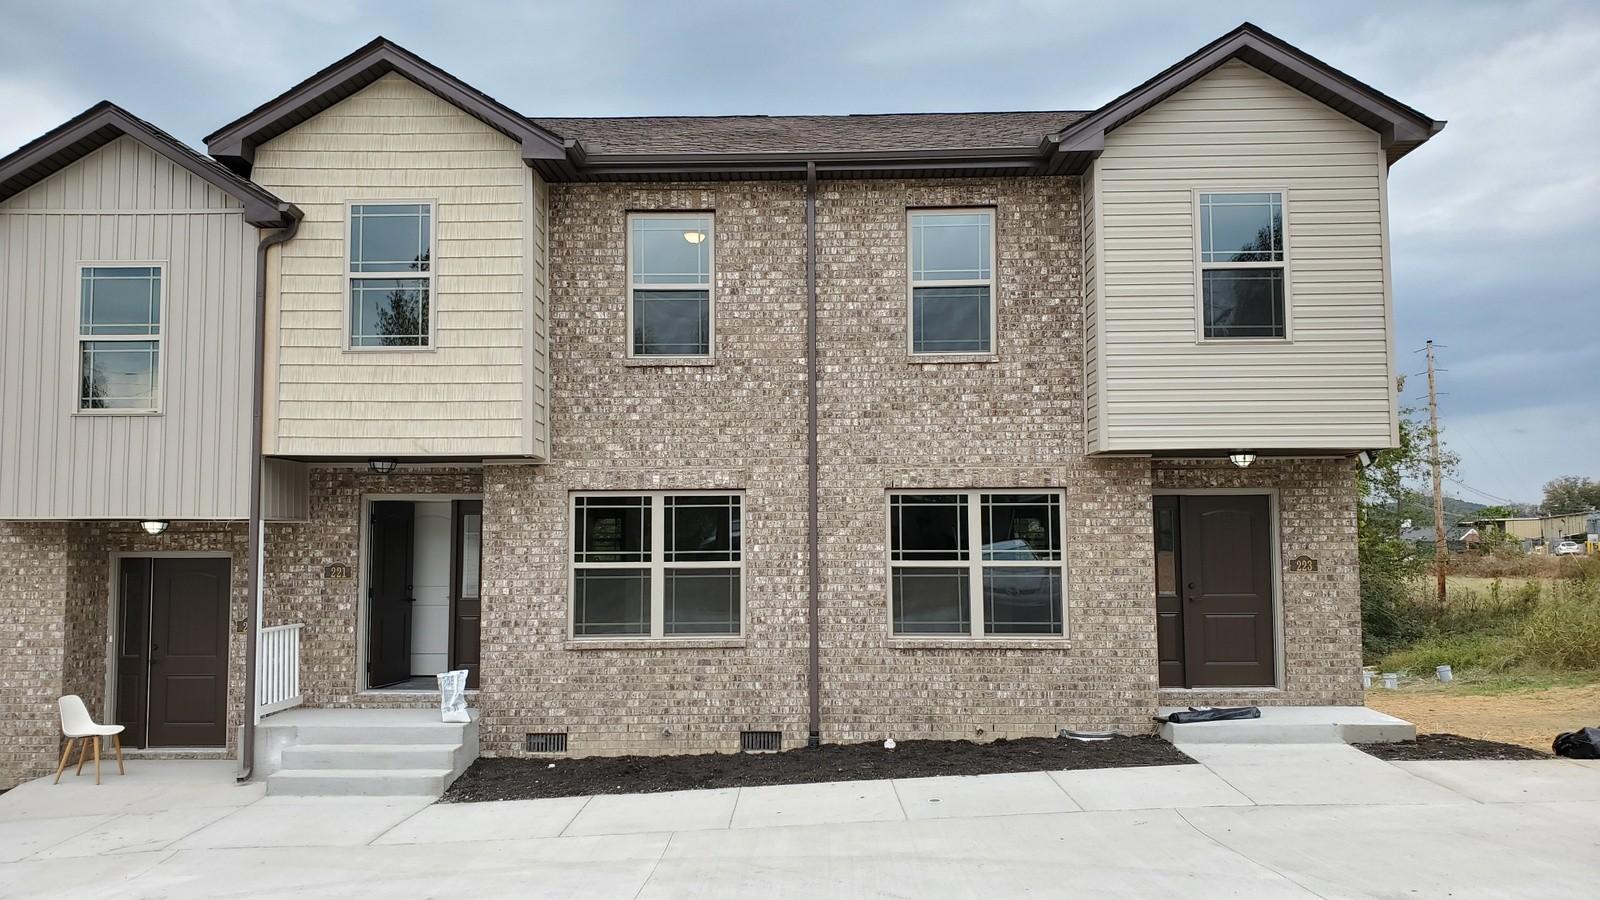 213 Hayes St., Hartsville, TN 37074 - Hartsville, TN real estate listing